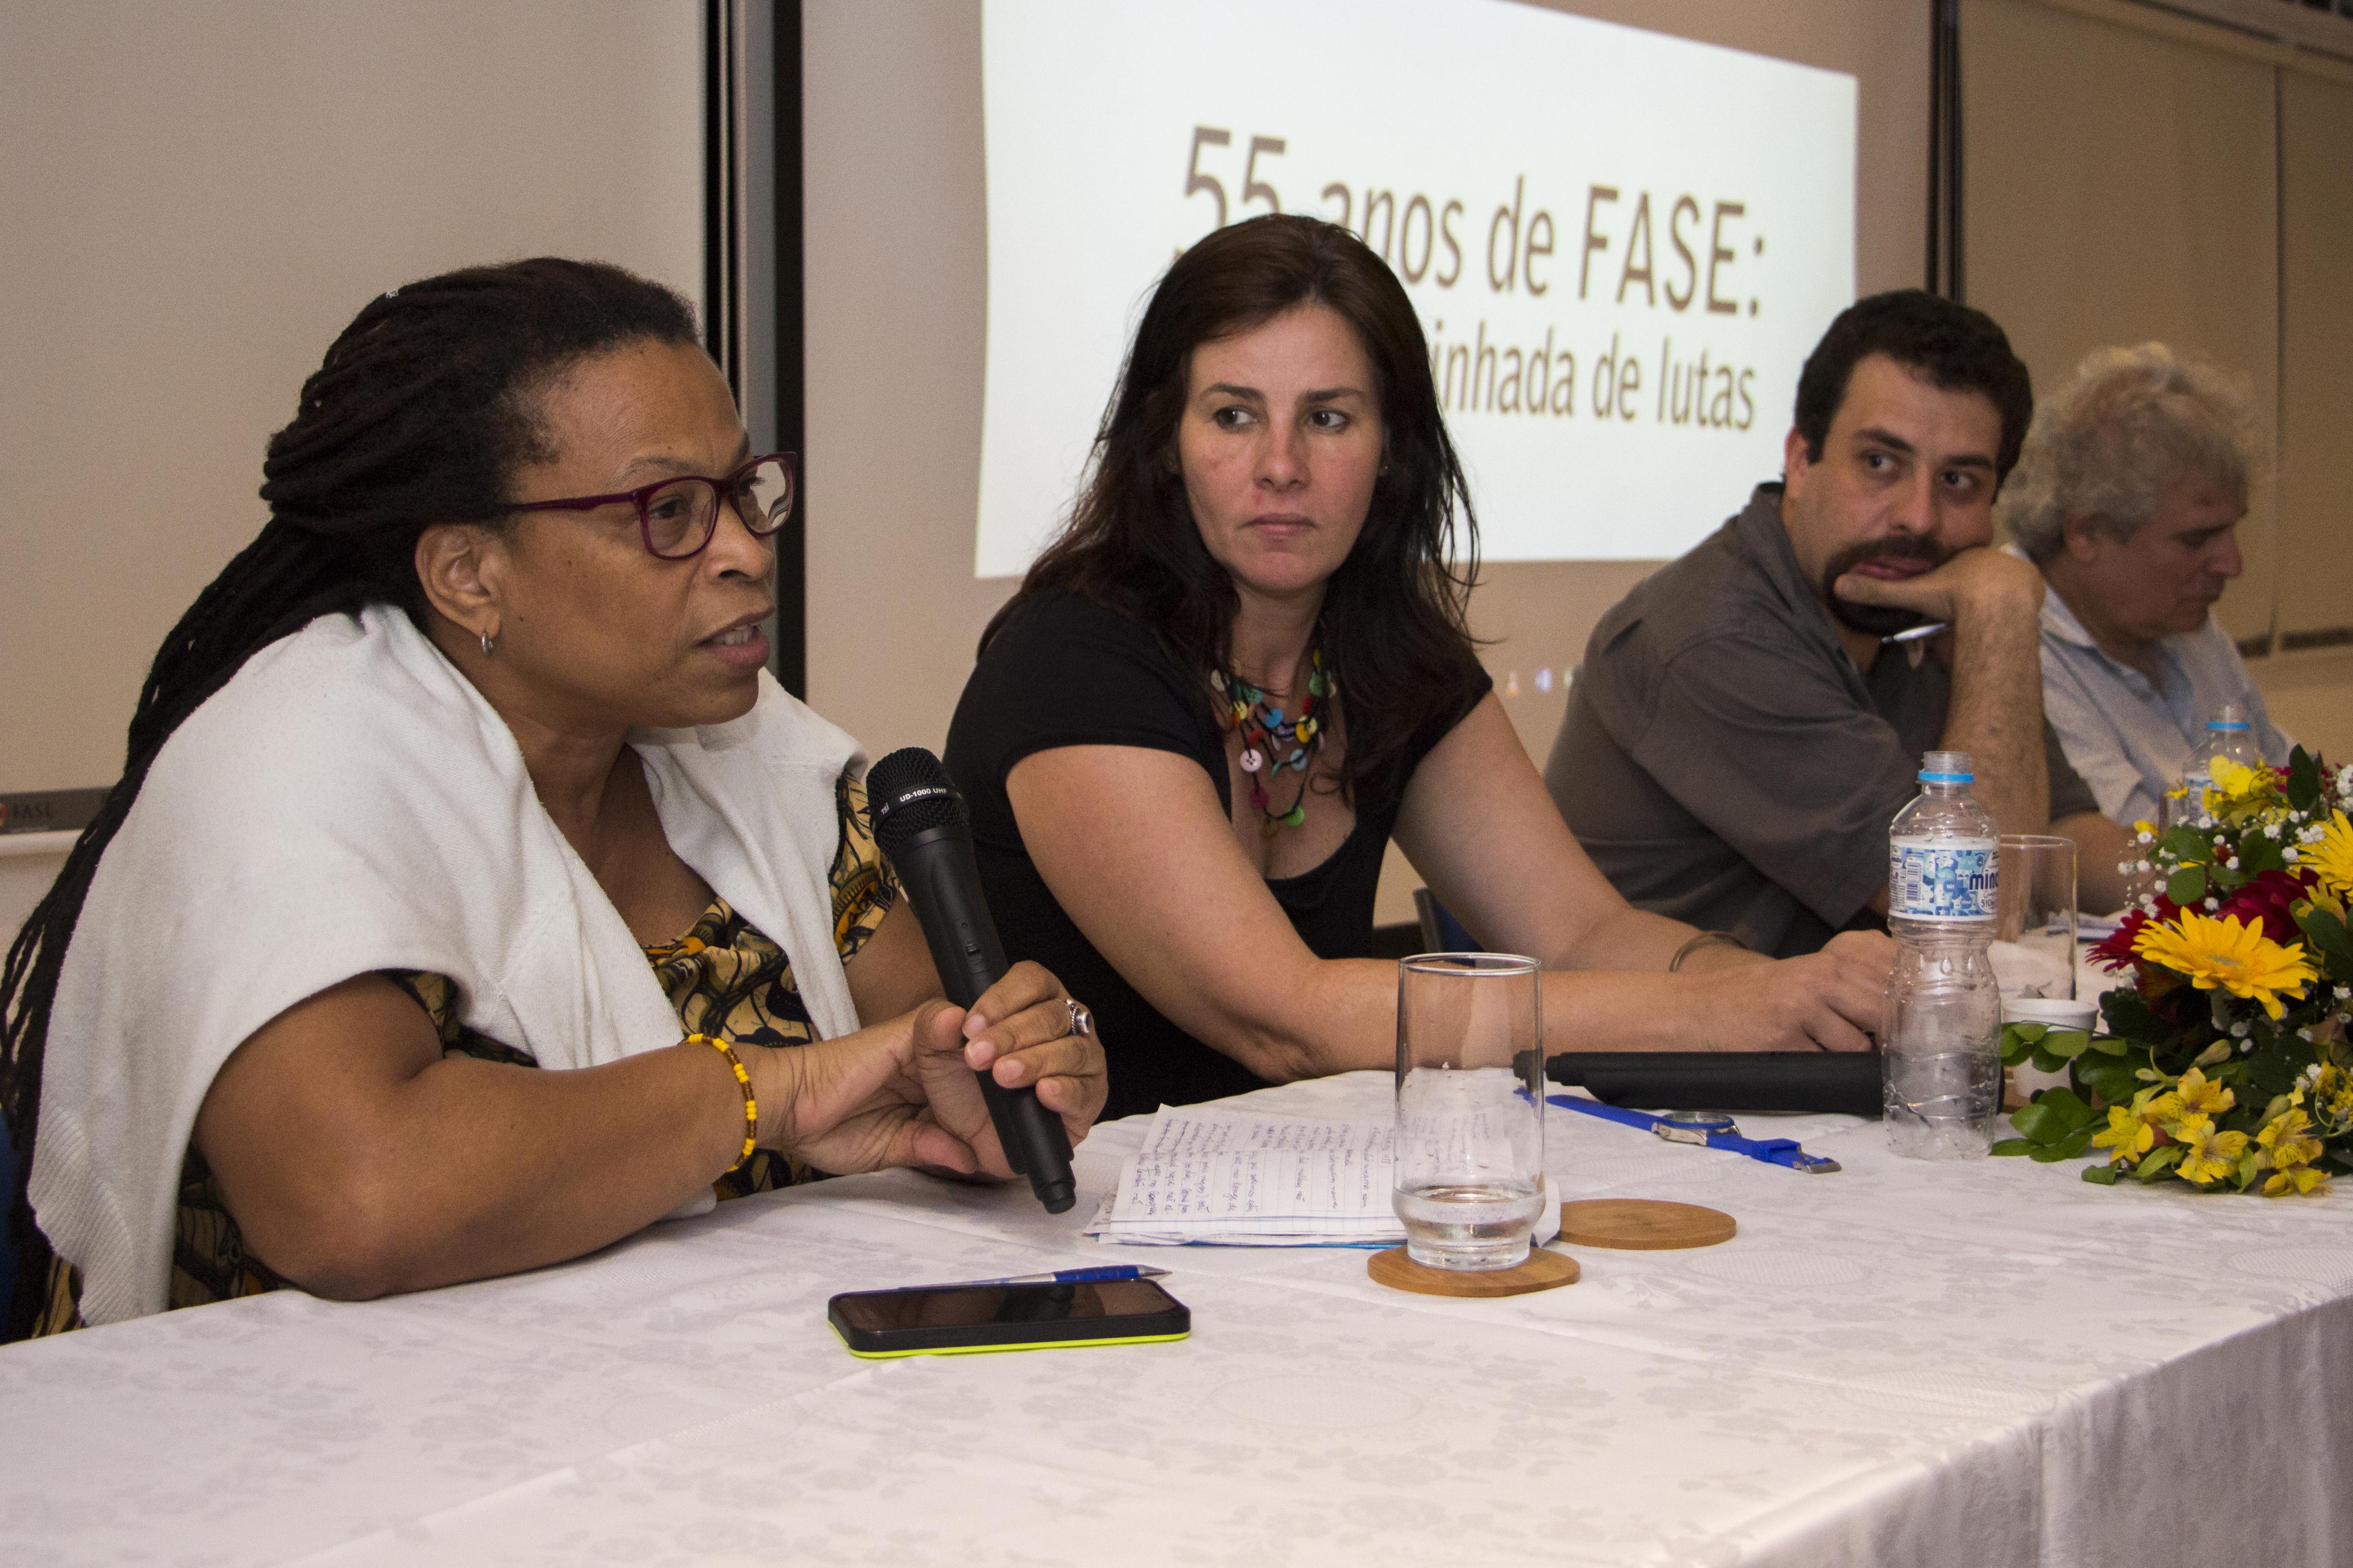 Seminário 55 anos da FASE. (Foto: Rosilene Miliotti / FASE)